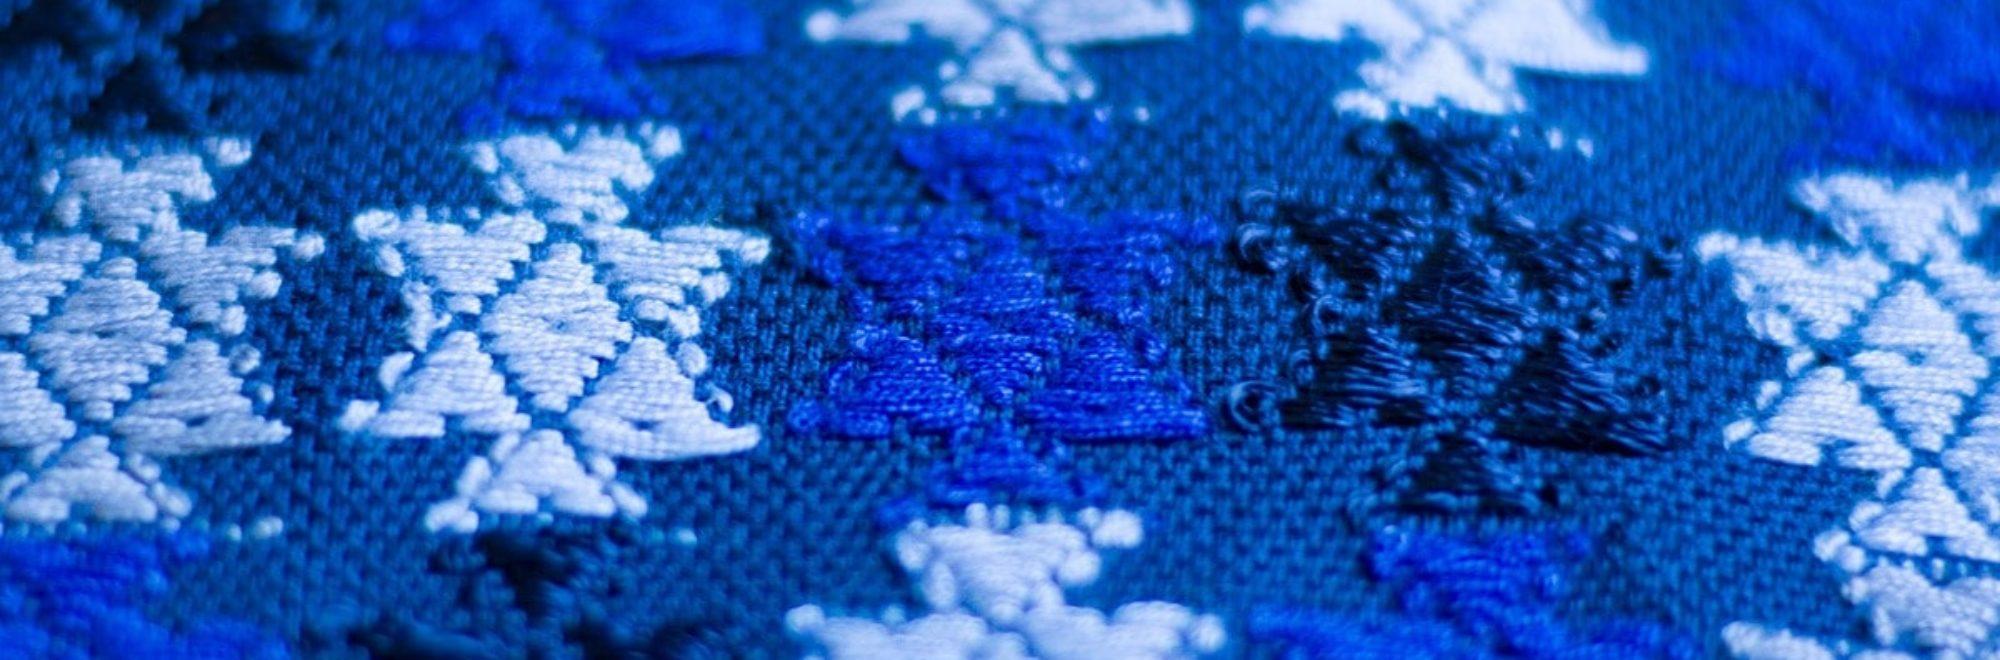 arte textil maya